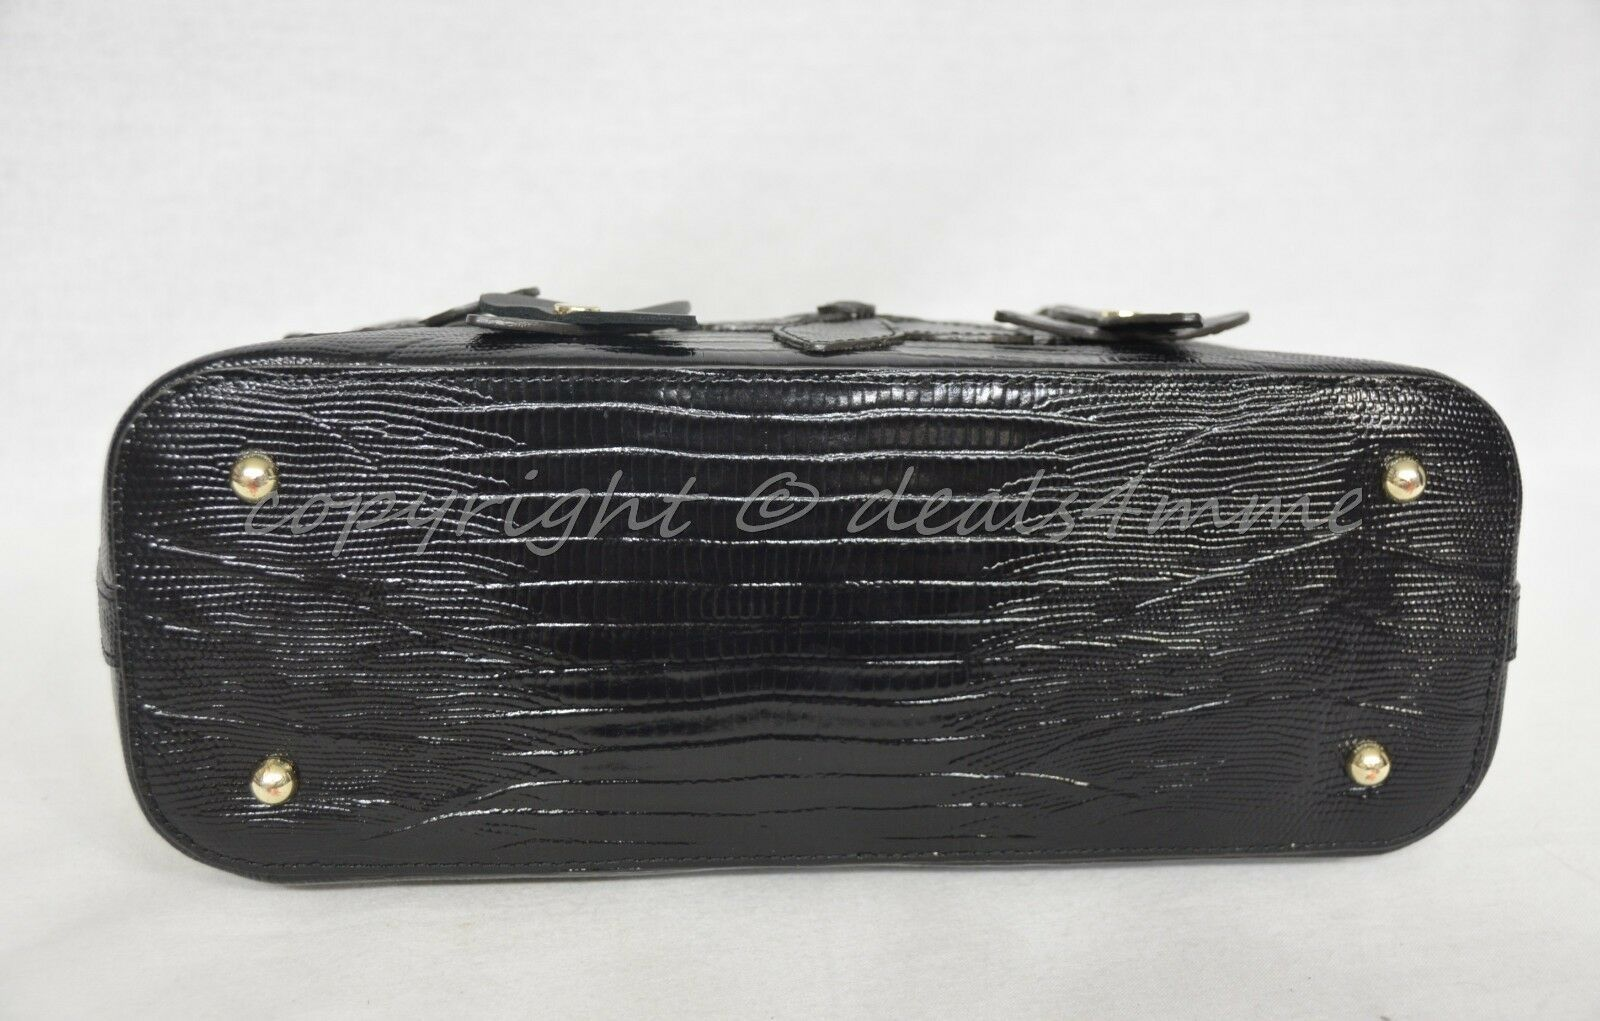 NWT Brahmin Mini Asher Satchel/Shoulder Bag in Black Miramonte-Cream with Black image 9